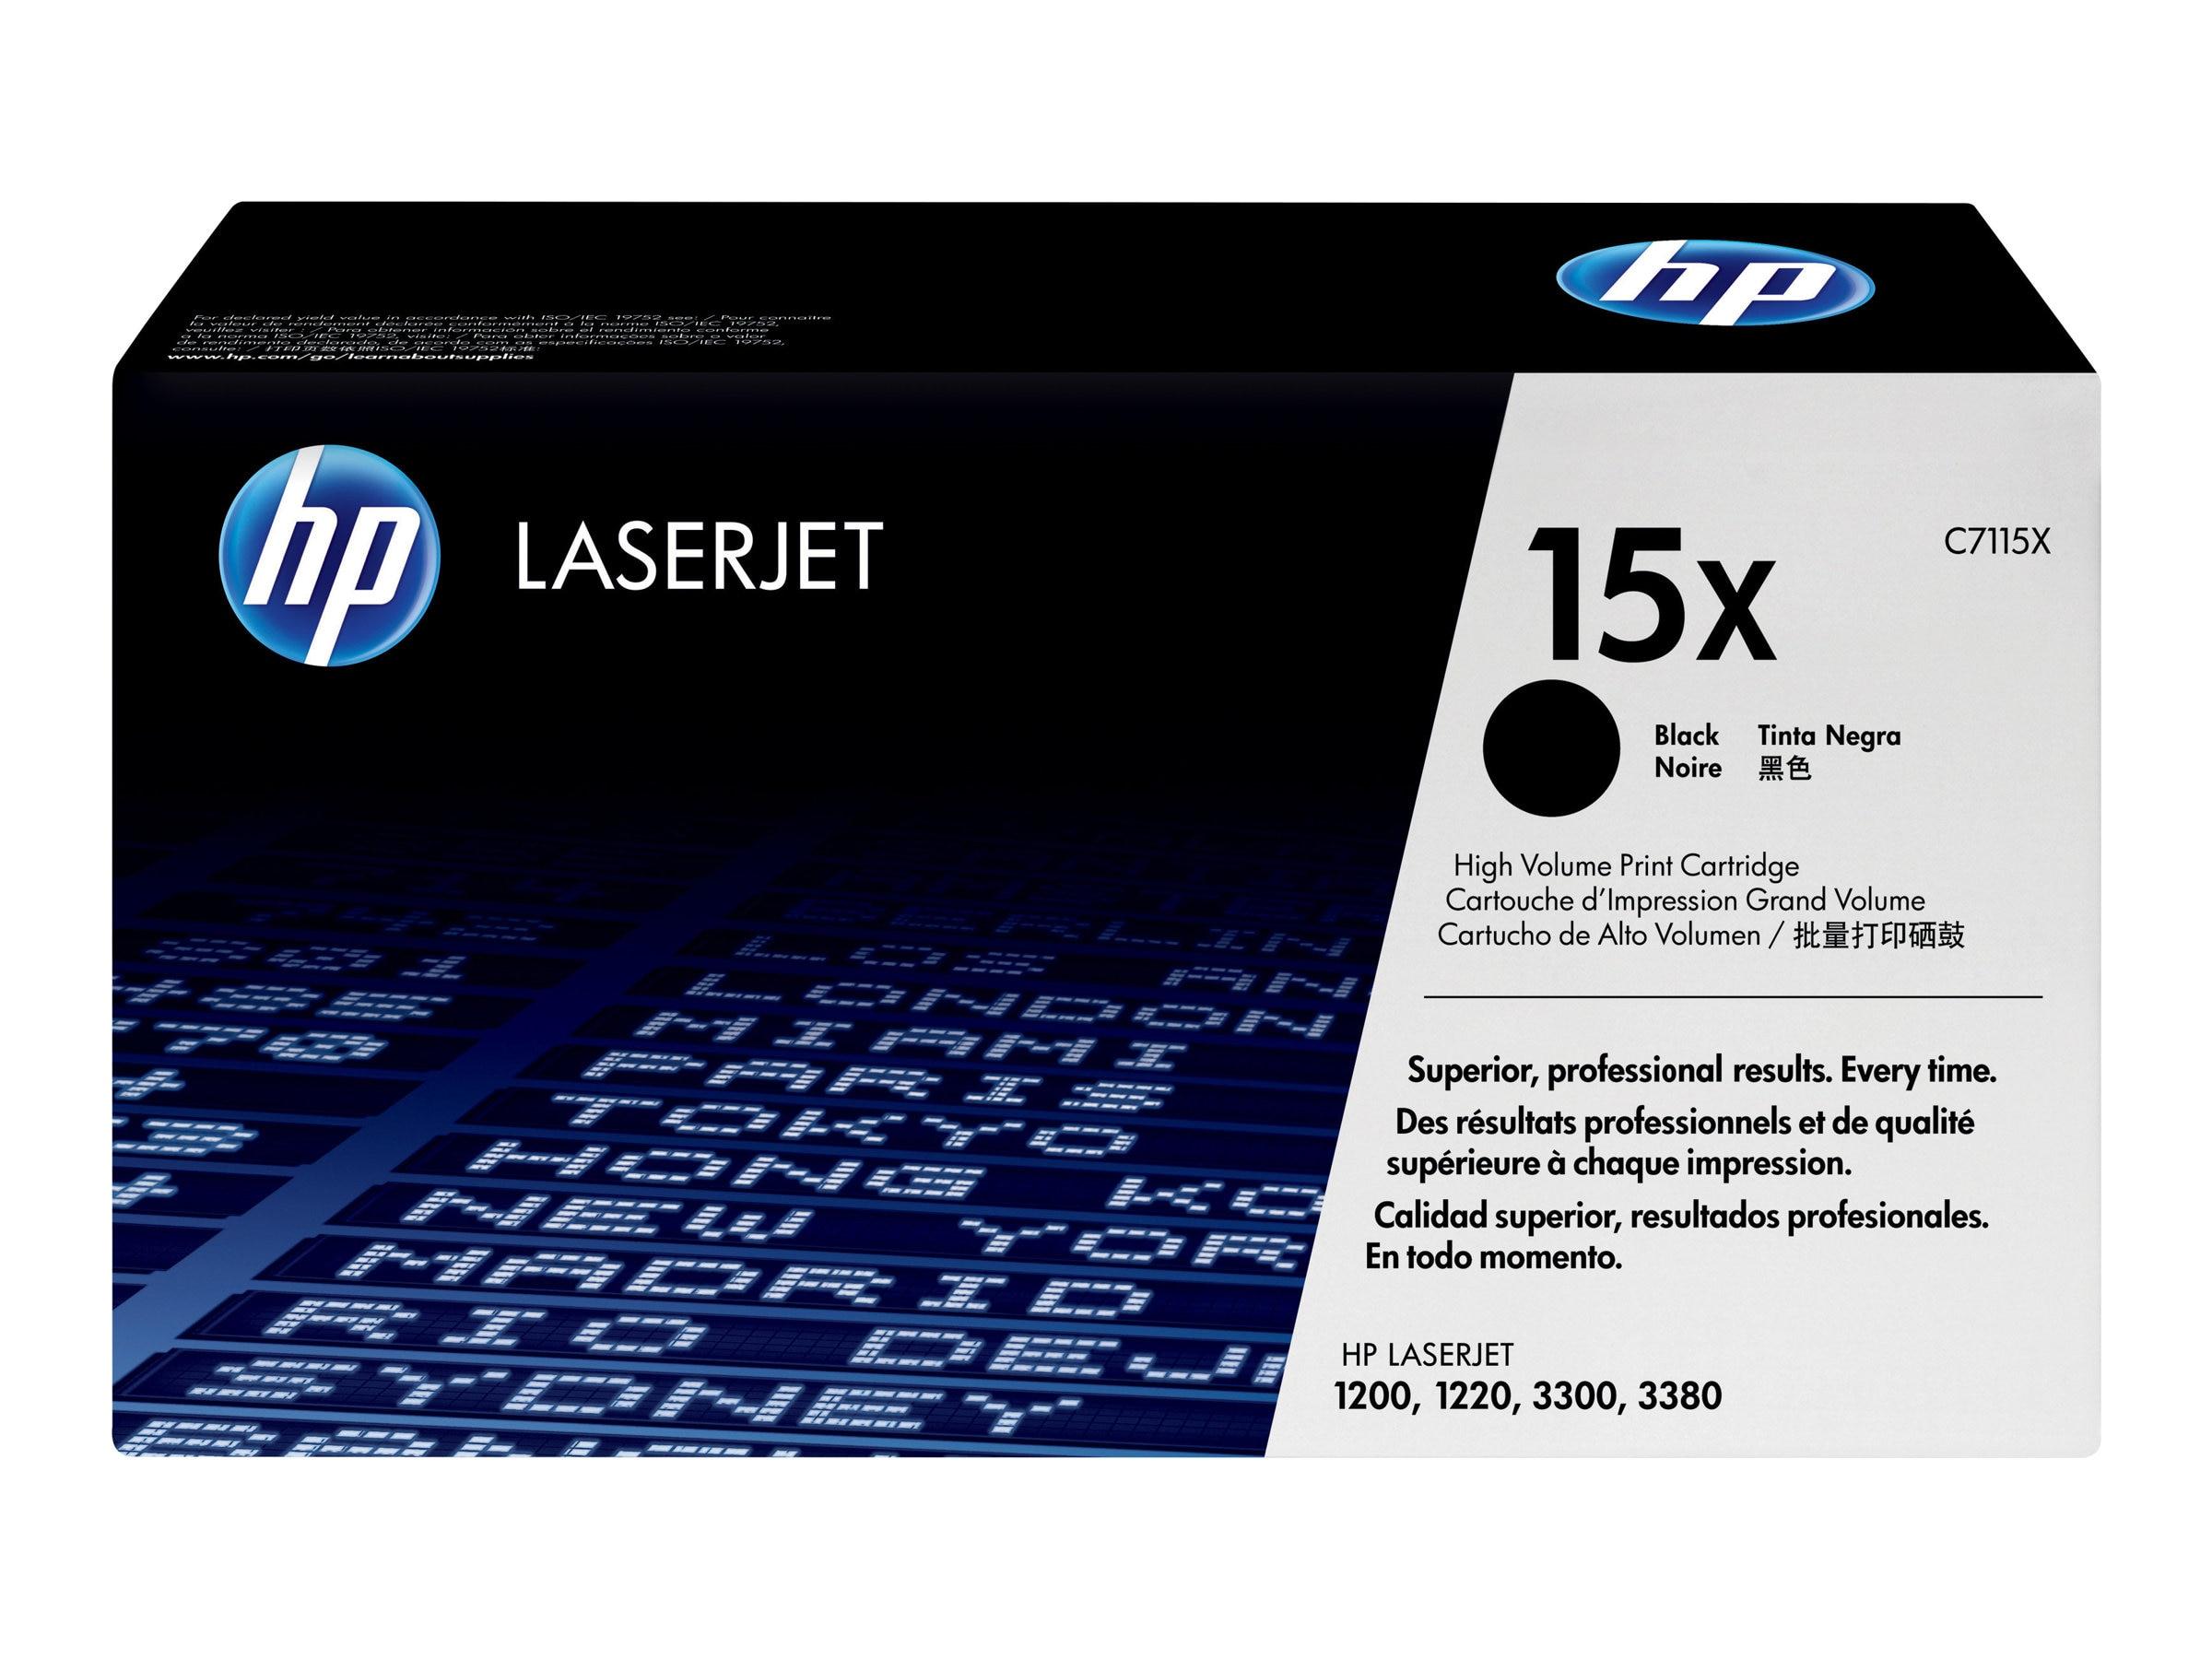 HP 15X (C7115X) High Yield Black Original LaserJet Toner Cartridge for HP LaserJet 1200, 1220, 3300, C7115X, 240638, Toner and Imaging Components